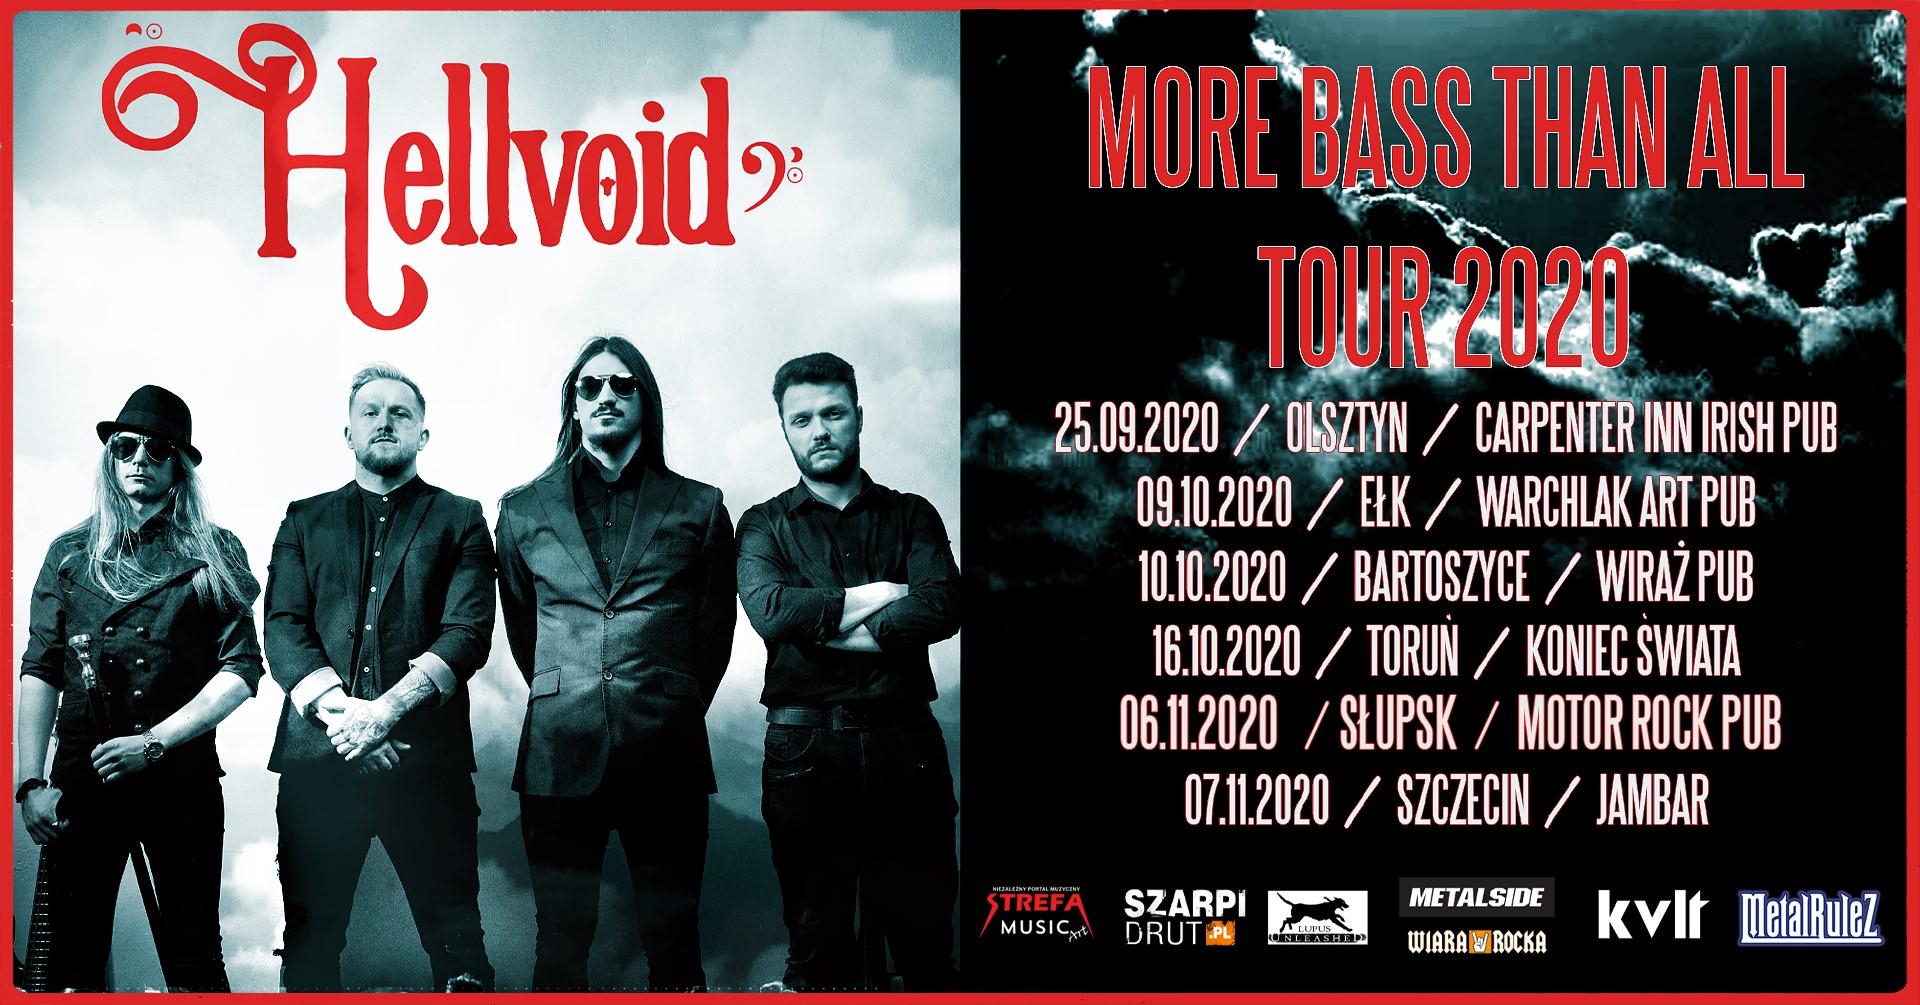 Słupsk / Hellvoid / Access Denied / TBA / More Bass Than All Tour 2020